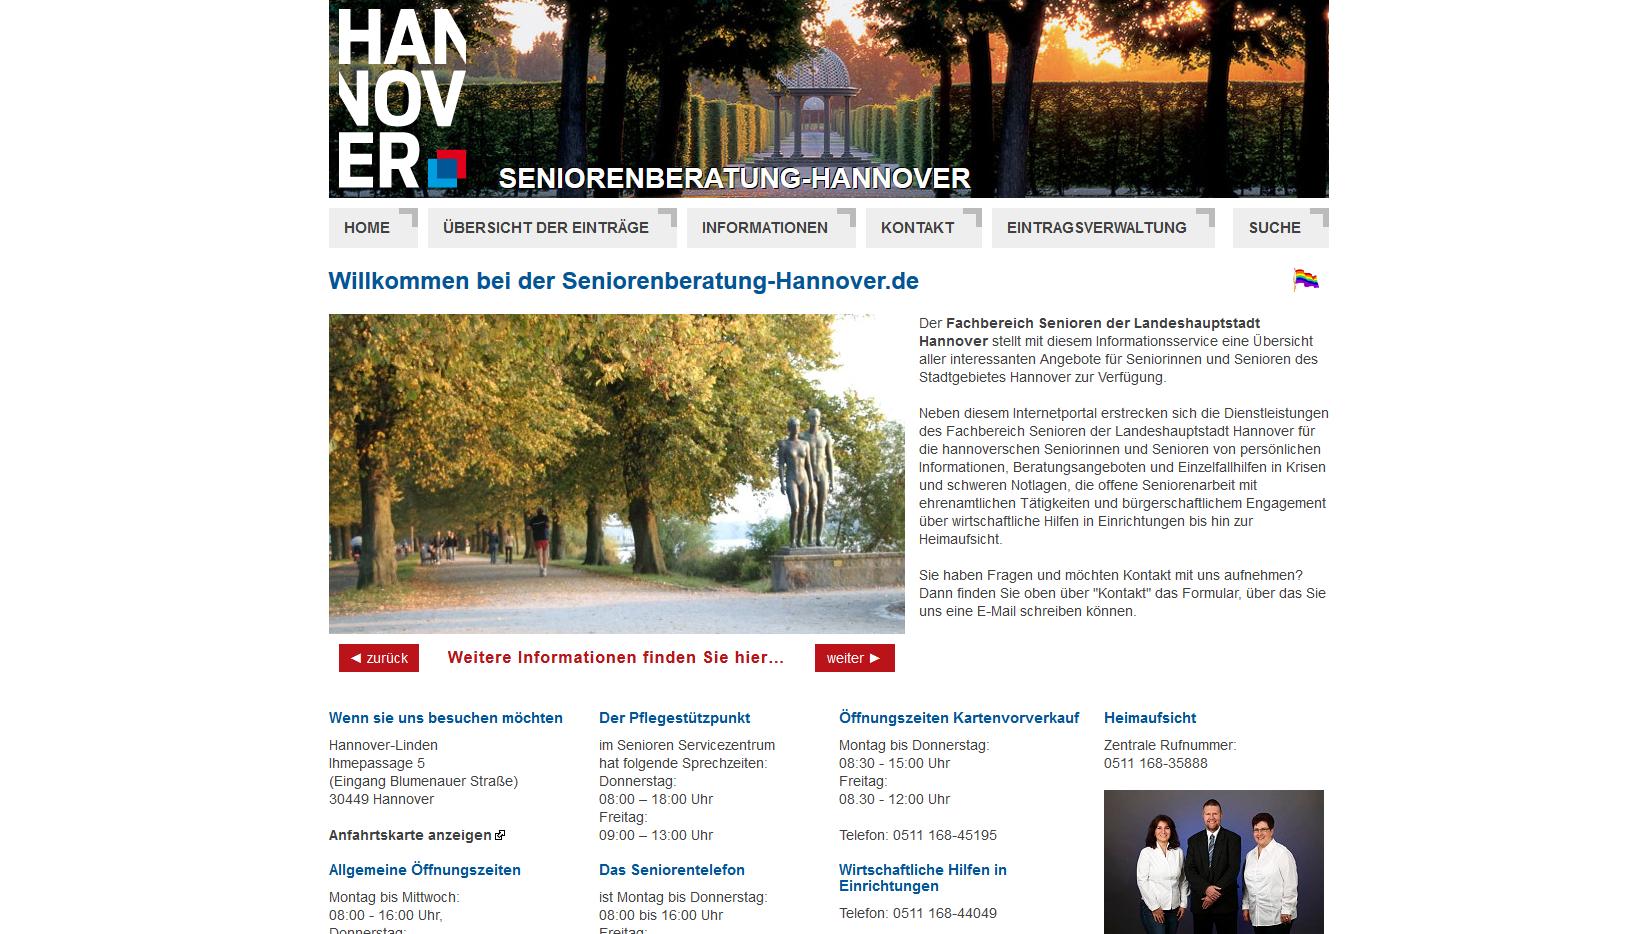 Seniorenberatung-Hannover.de